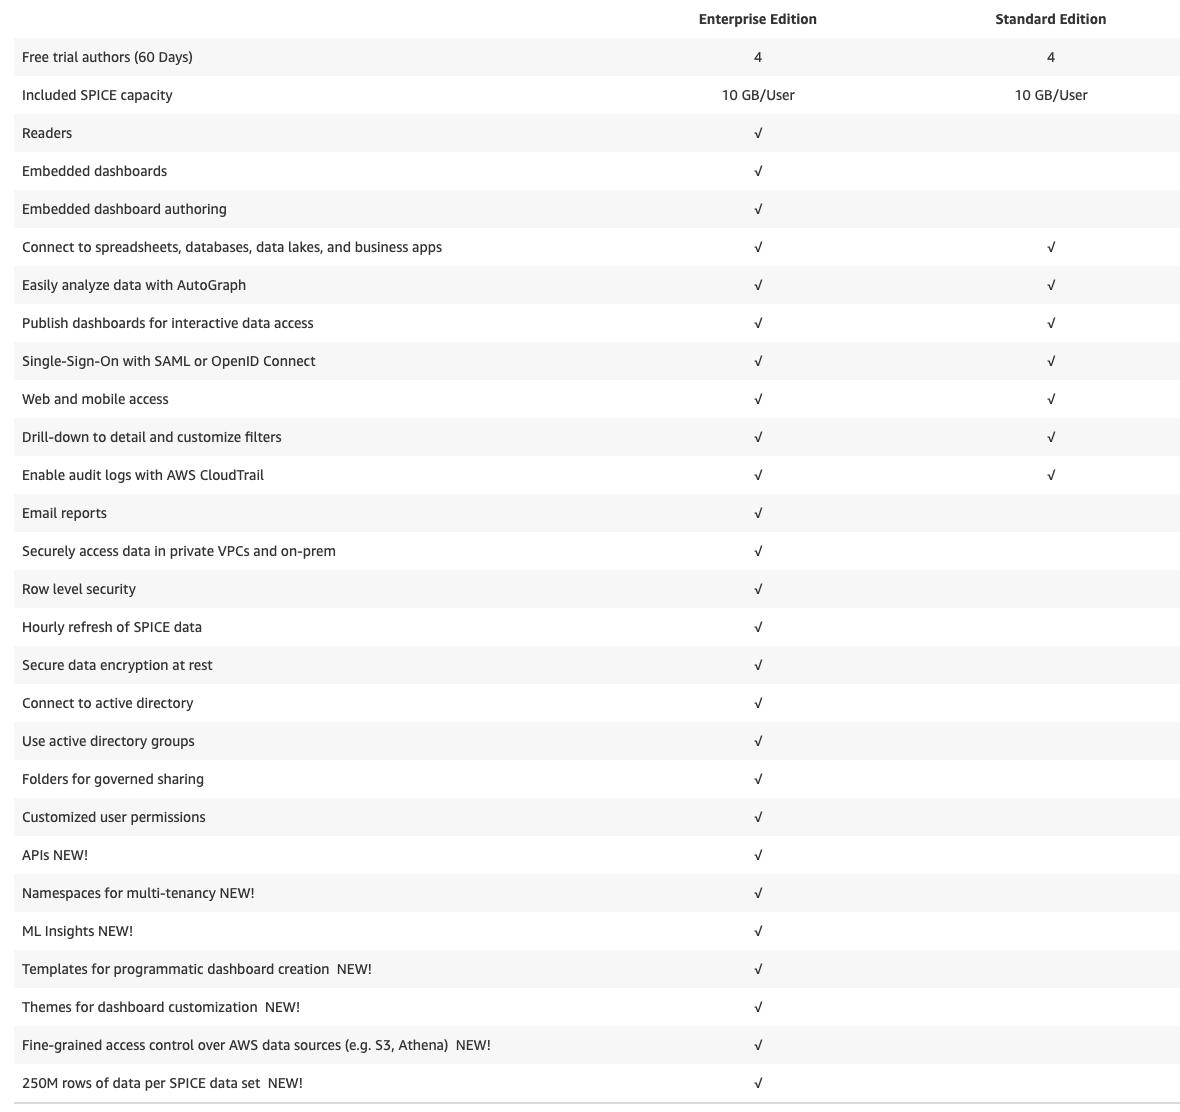 QuickSight Editions Comparison